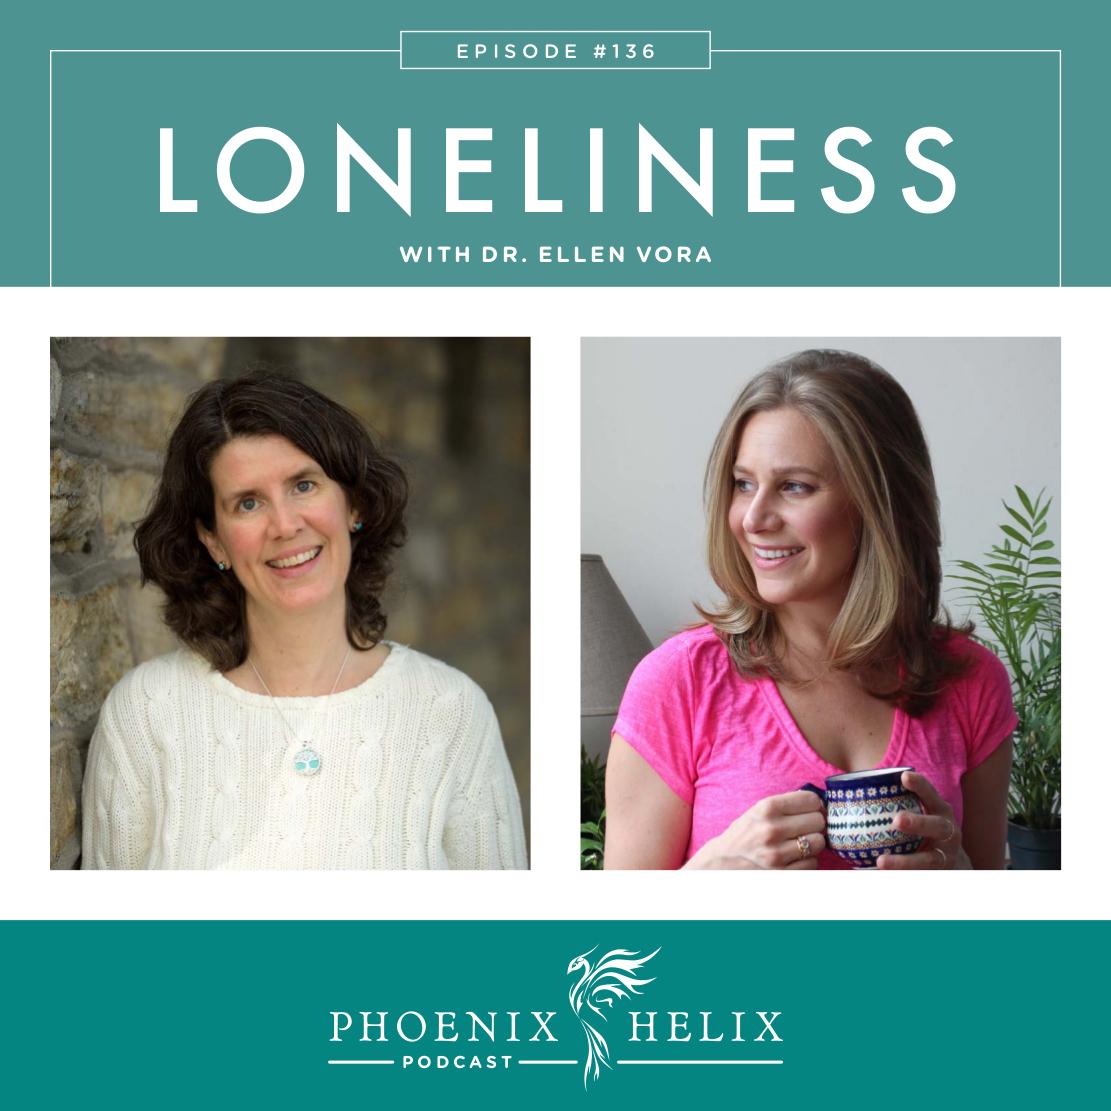 Loneliness with Dr. Ellen Vora | Phoenix Helix Podcast